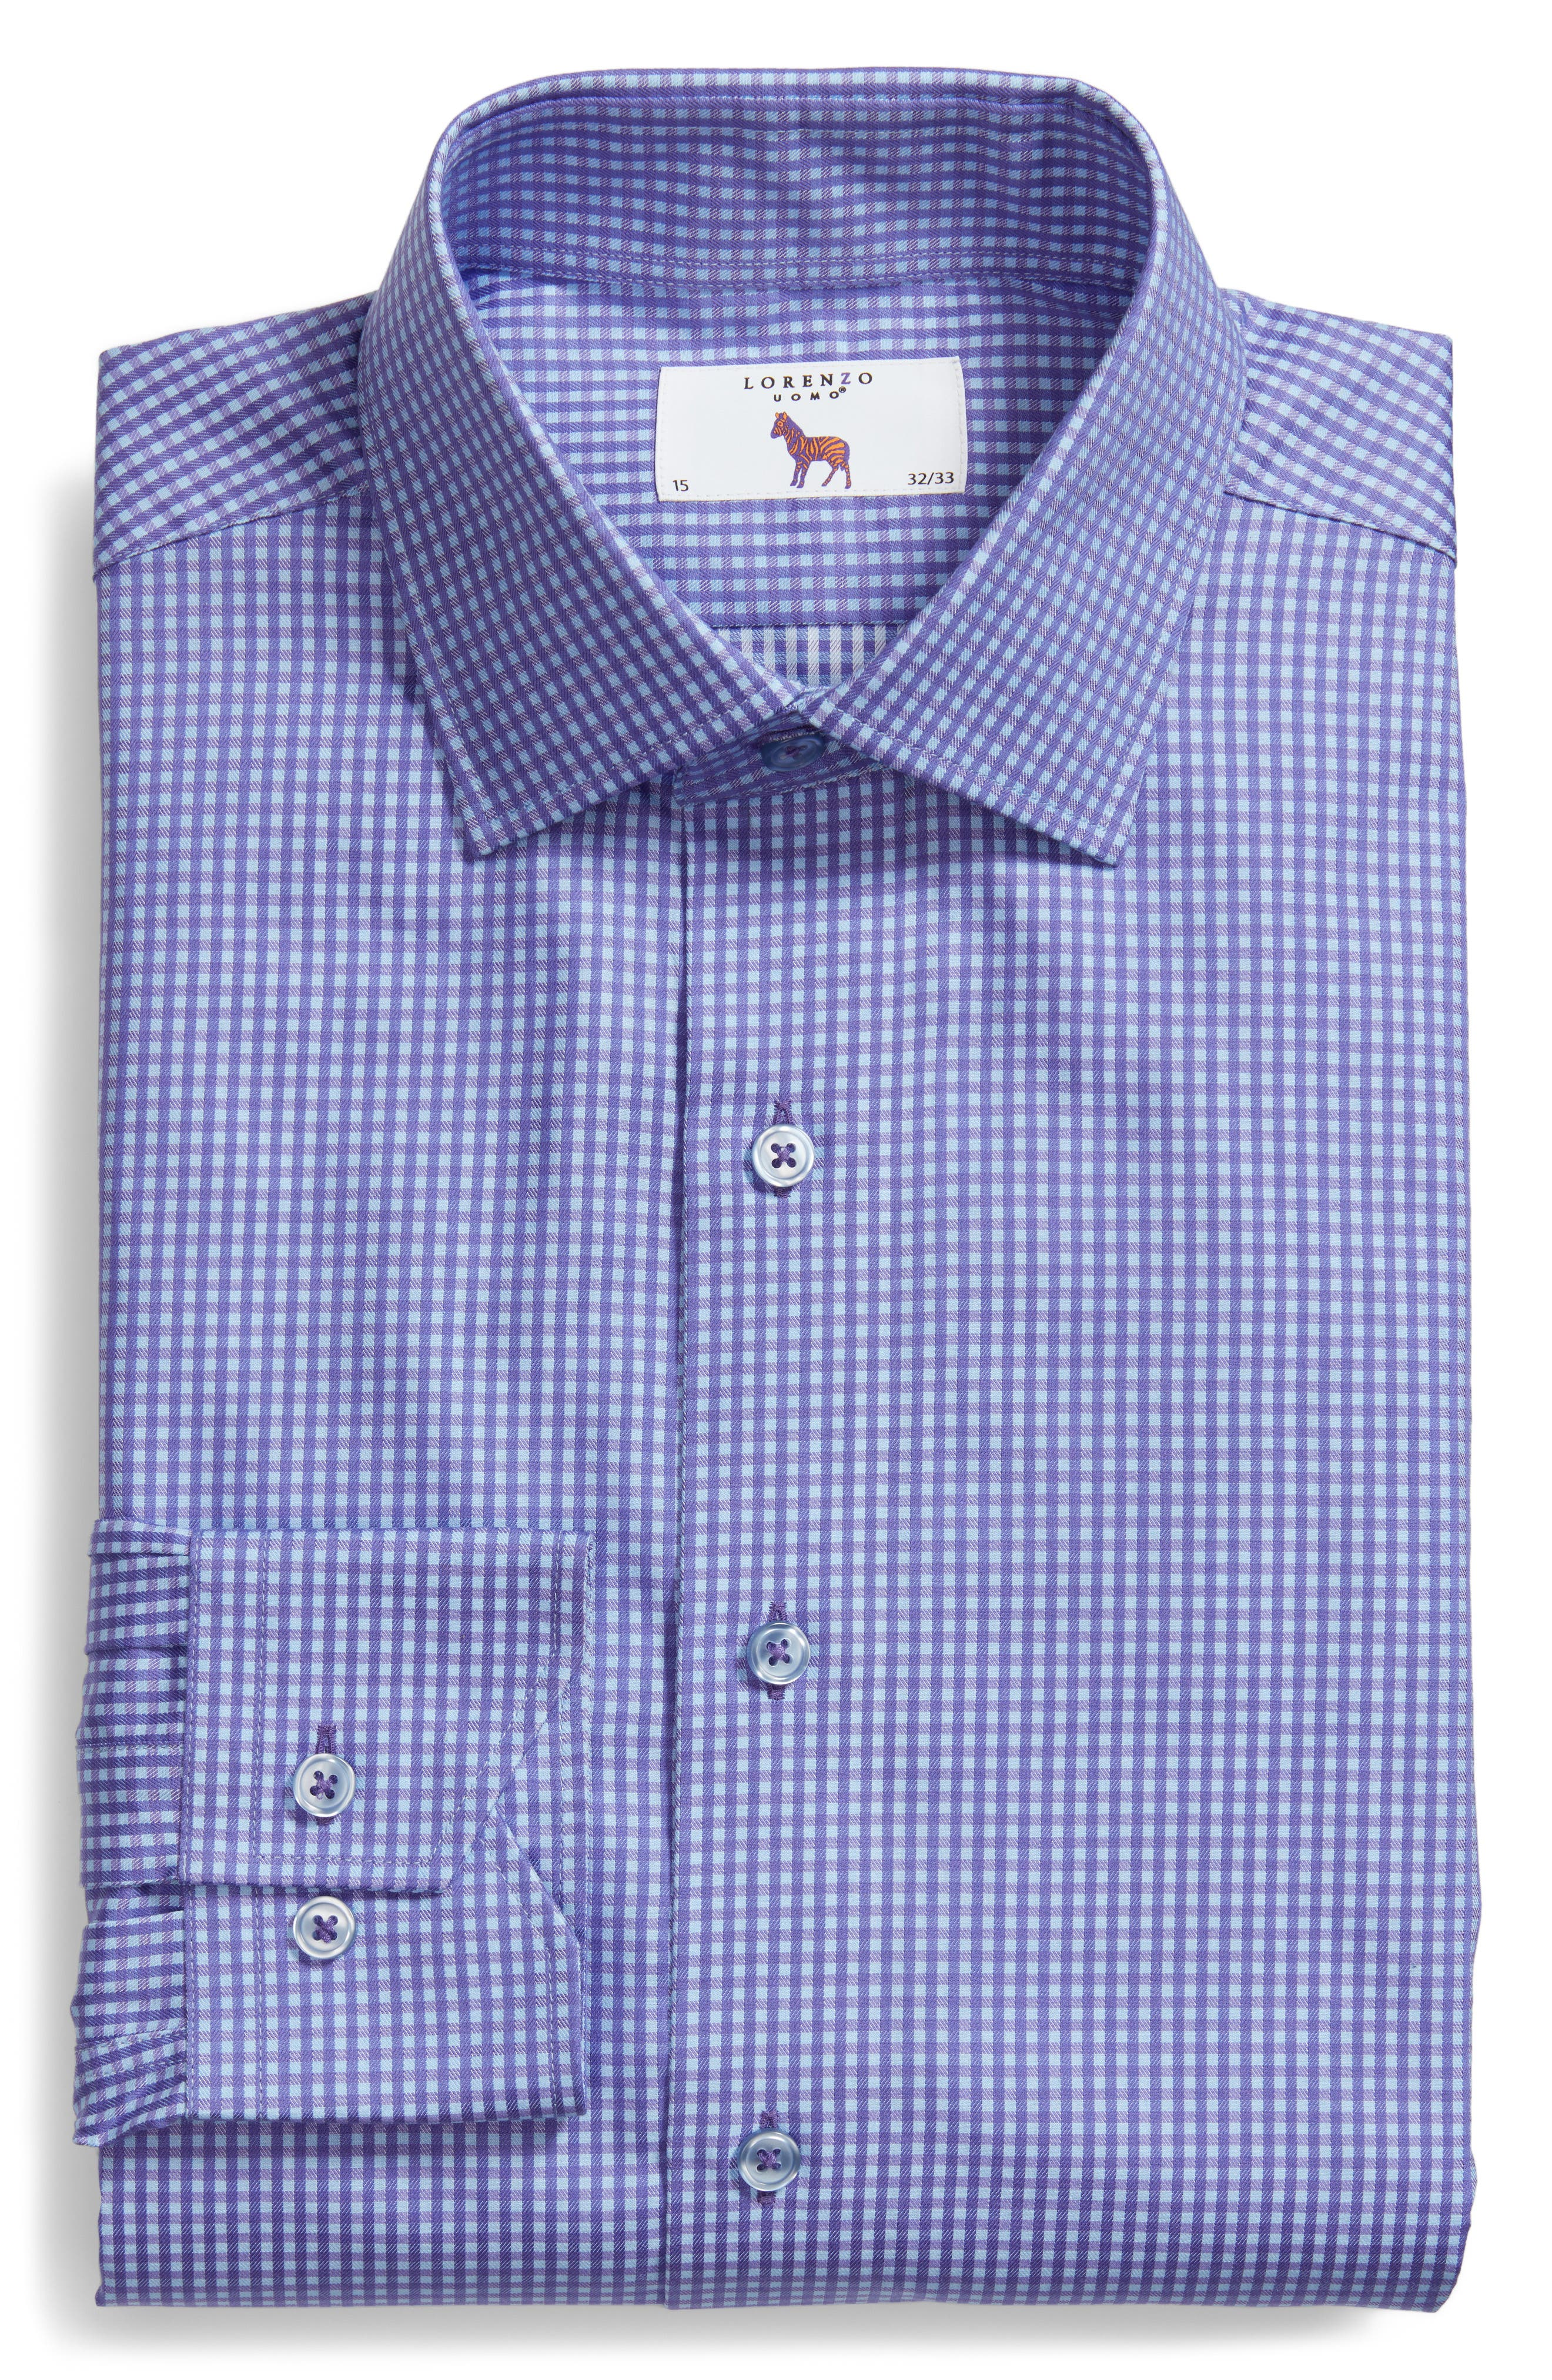 LORENZO UOMO,                             Trim Fit Mini Check Dress Shirt,                             Alternate thumbnail 5, color,                             510